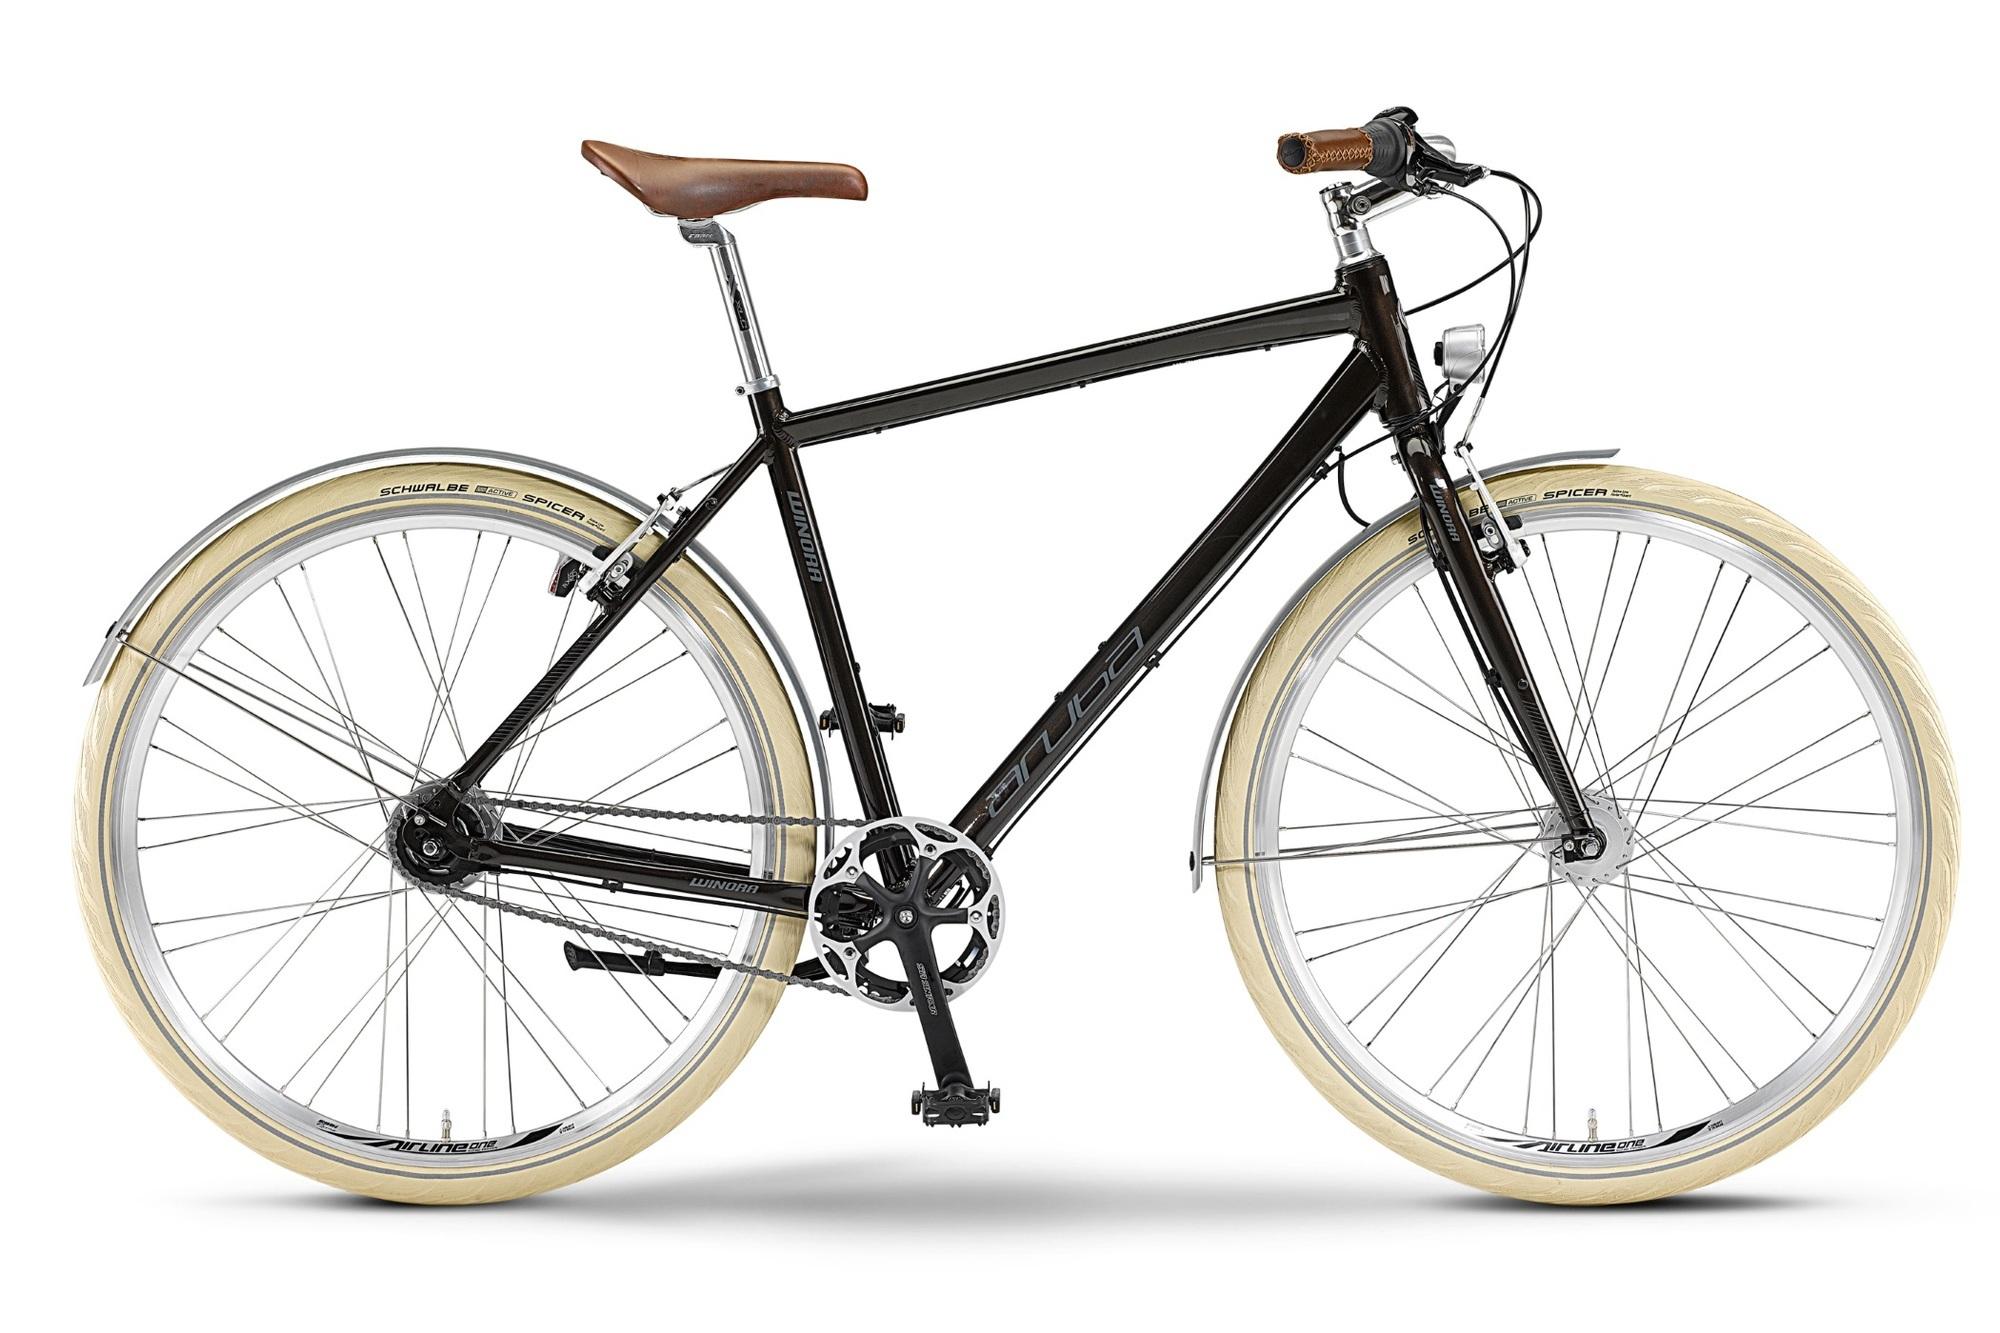 Fahrradtrends 2015 - Schicker strampeln